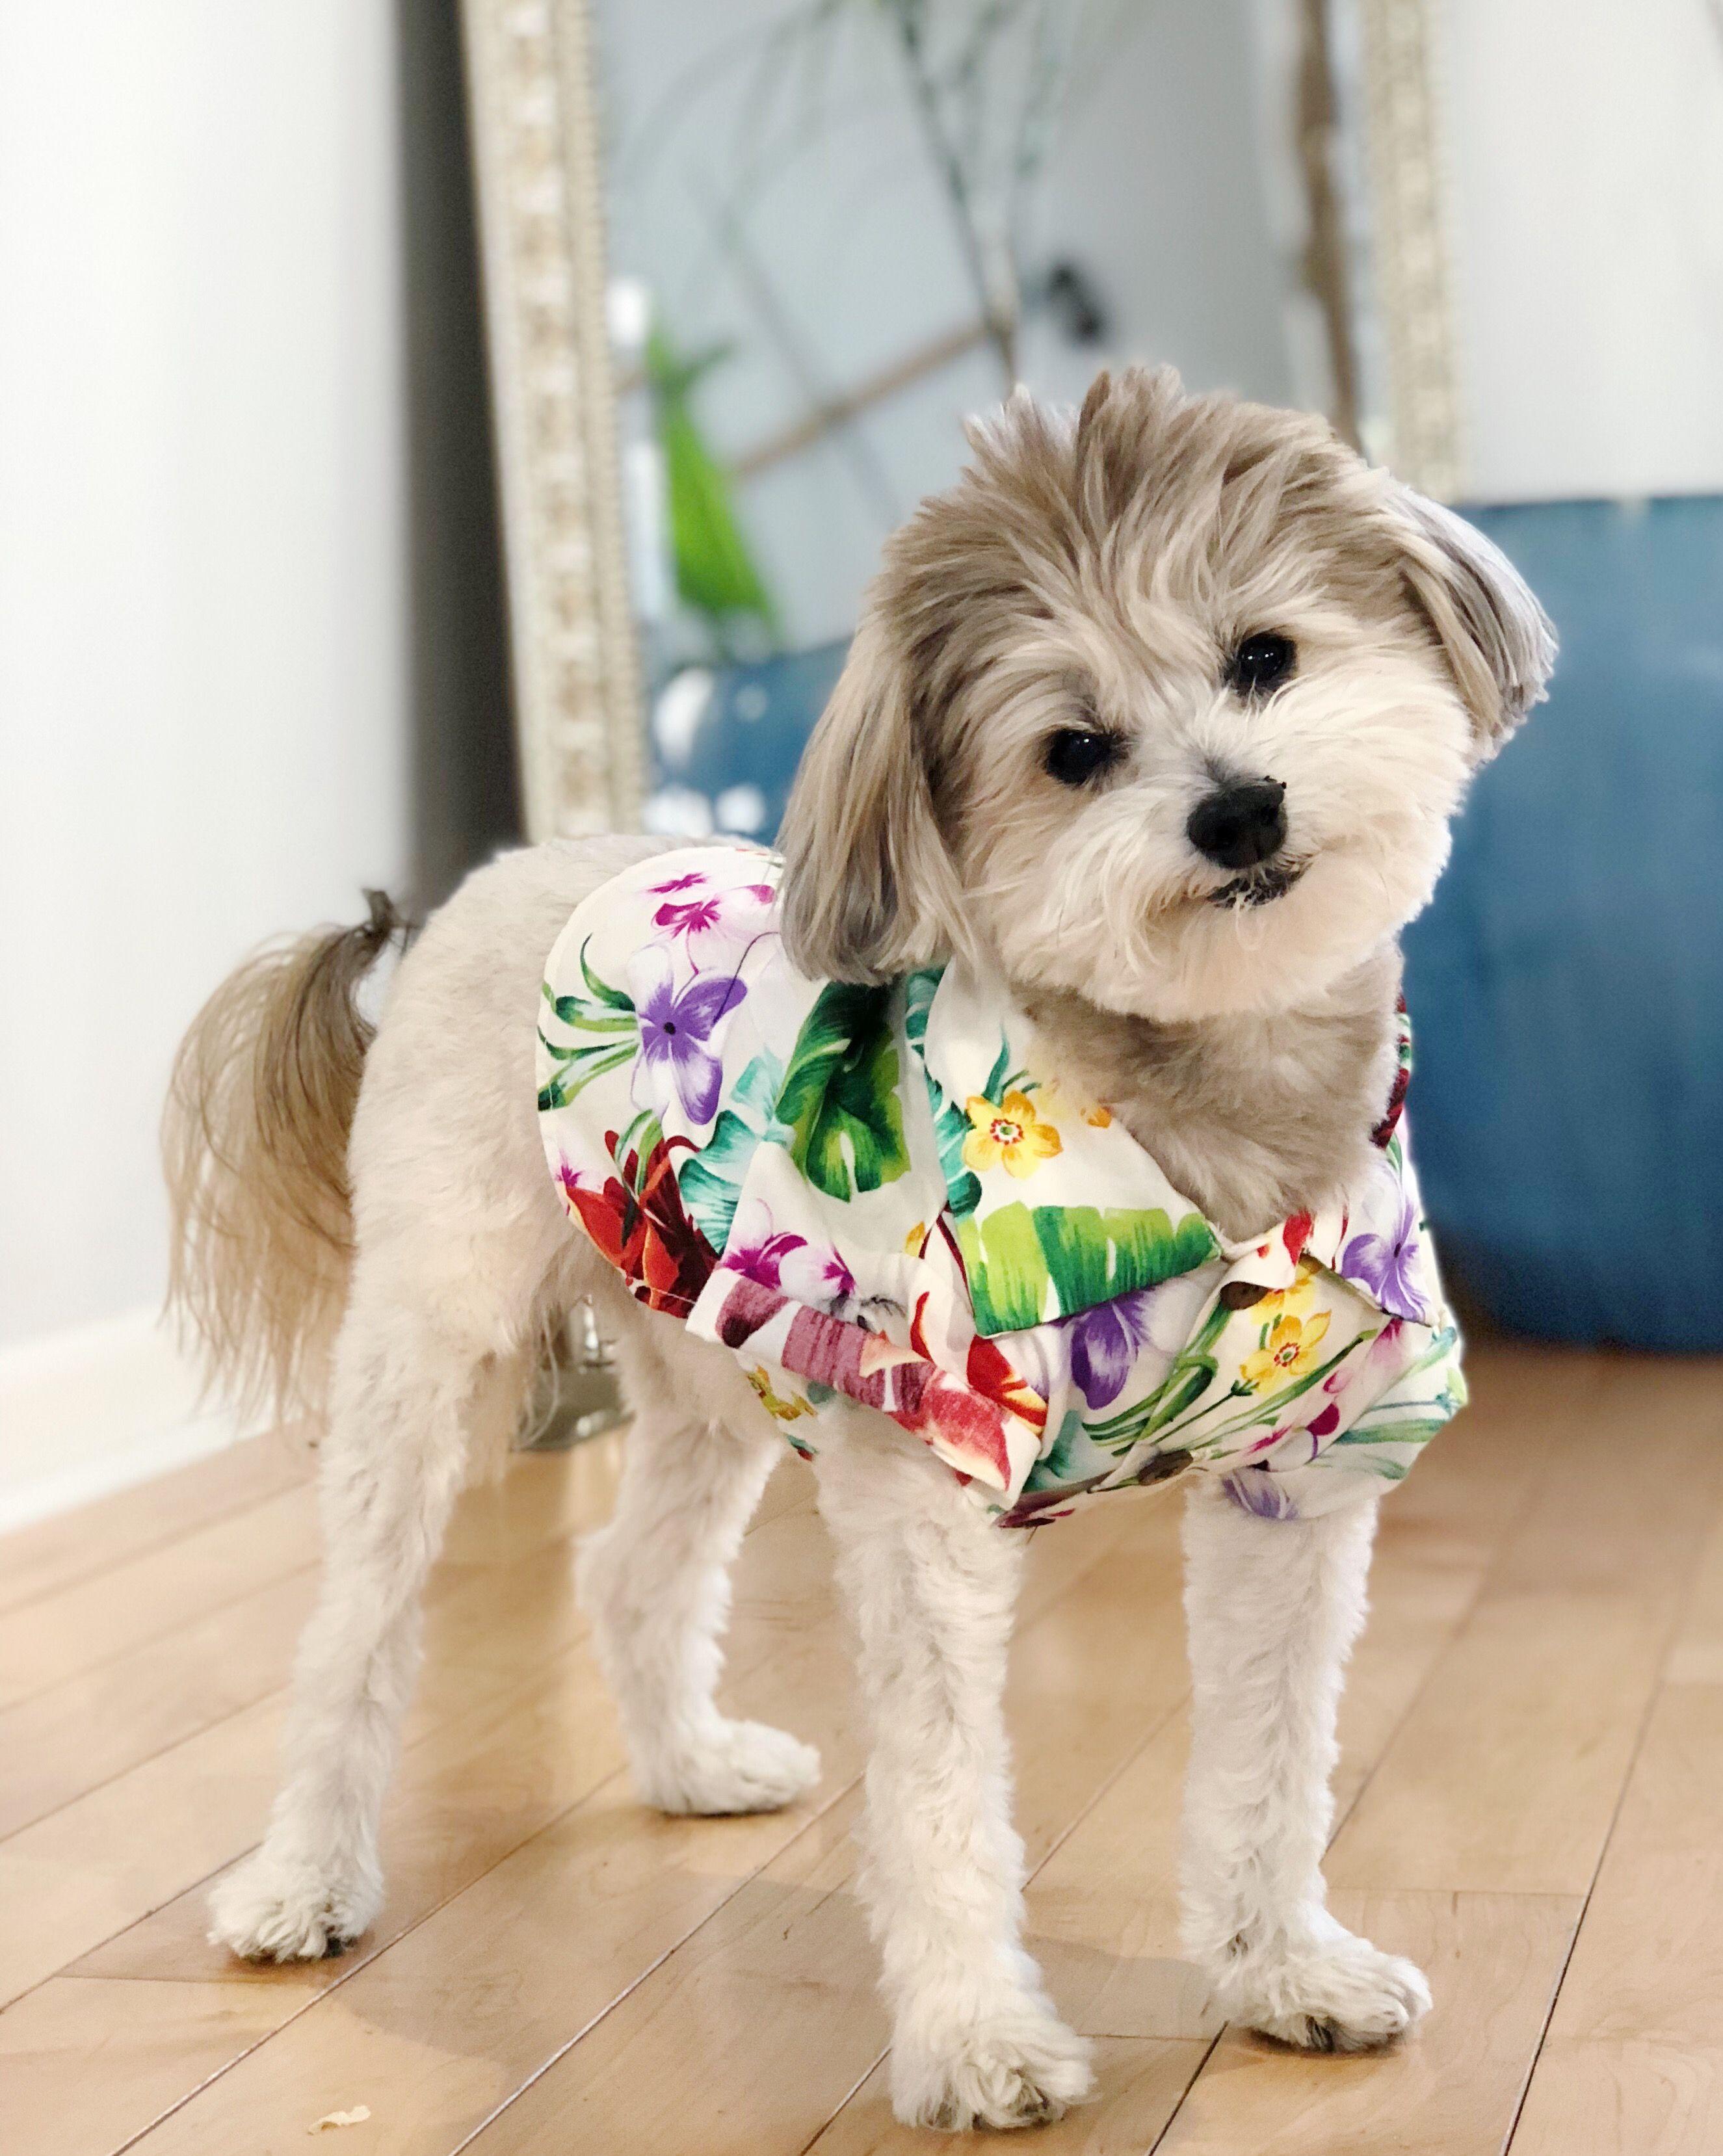 Dogs In Clothes Modern Dog Hawaiian Dog Shirt Fashion For Dogs By Dog Threads Stylish Dog Clothes Cute Dog Clothes Dog Clothes Cute Dogs Cute Dog Clothes